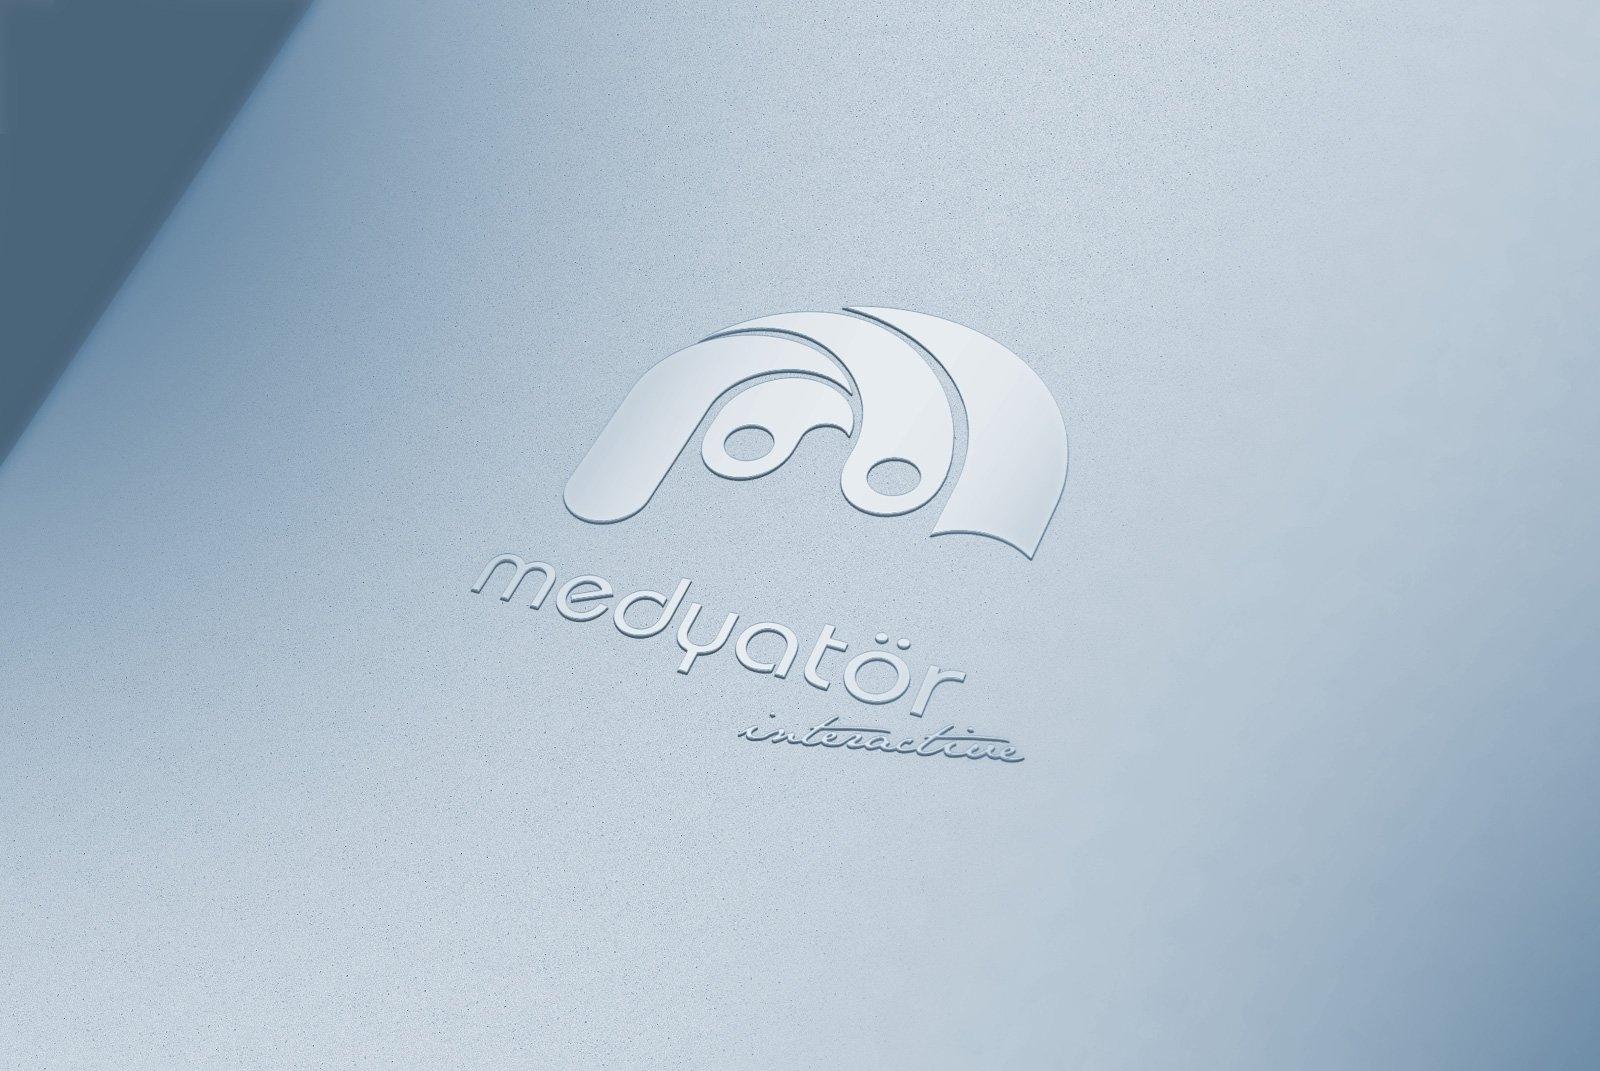 medyator (@medyator) Cover Image